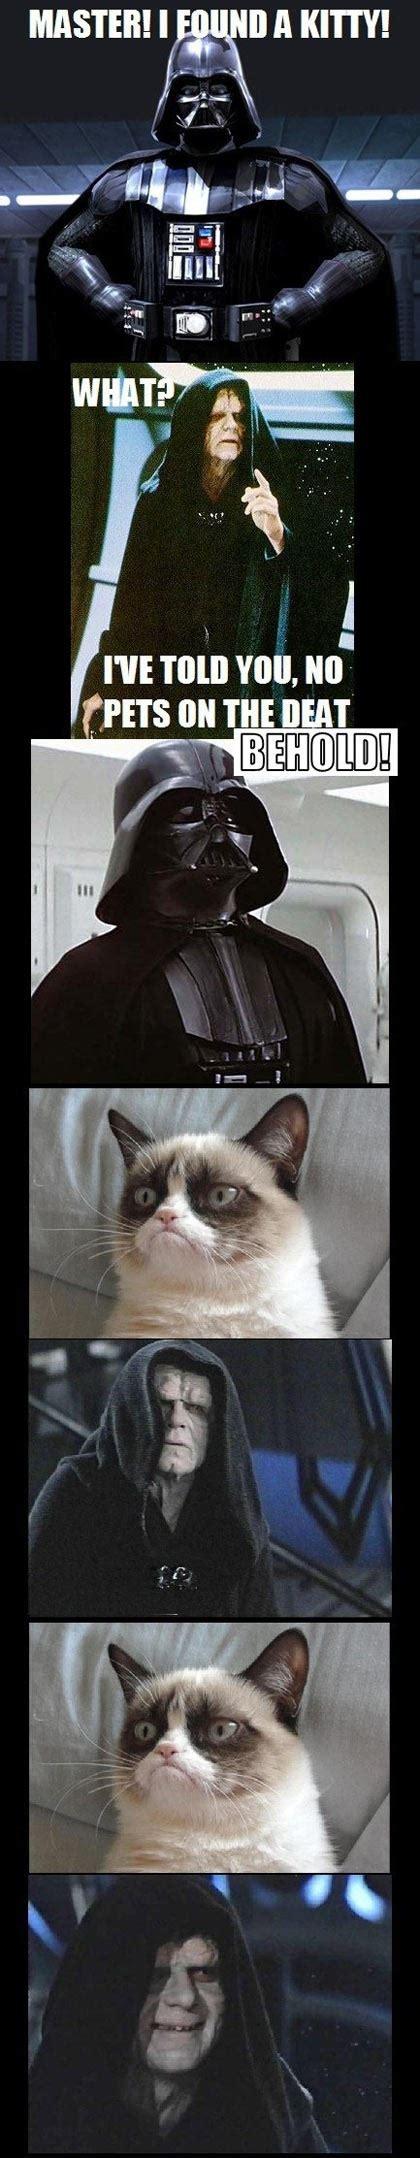 Star Wars Cat Meme - darth vader found grumpy cat grumpy cat know your meme